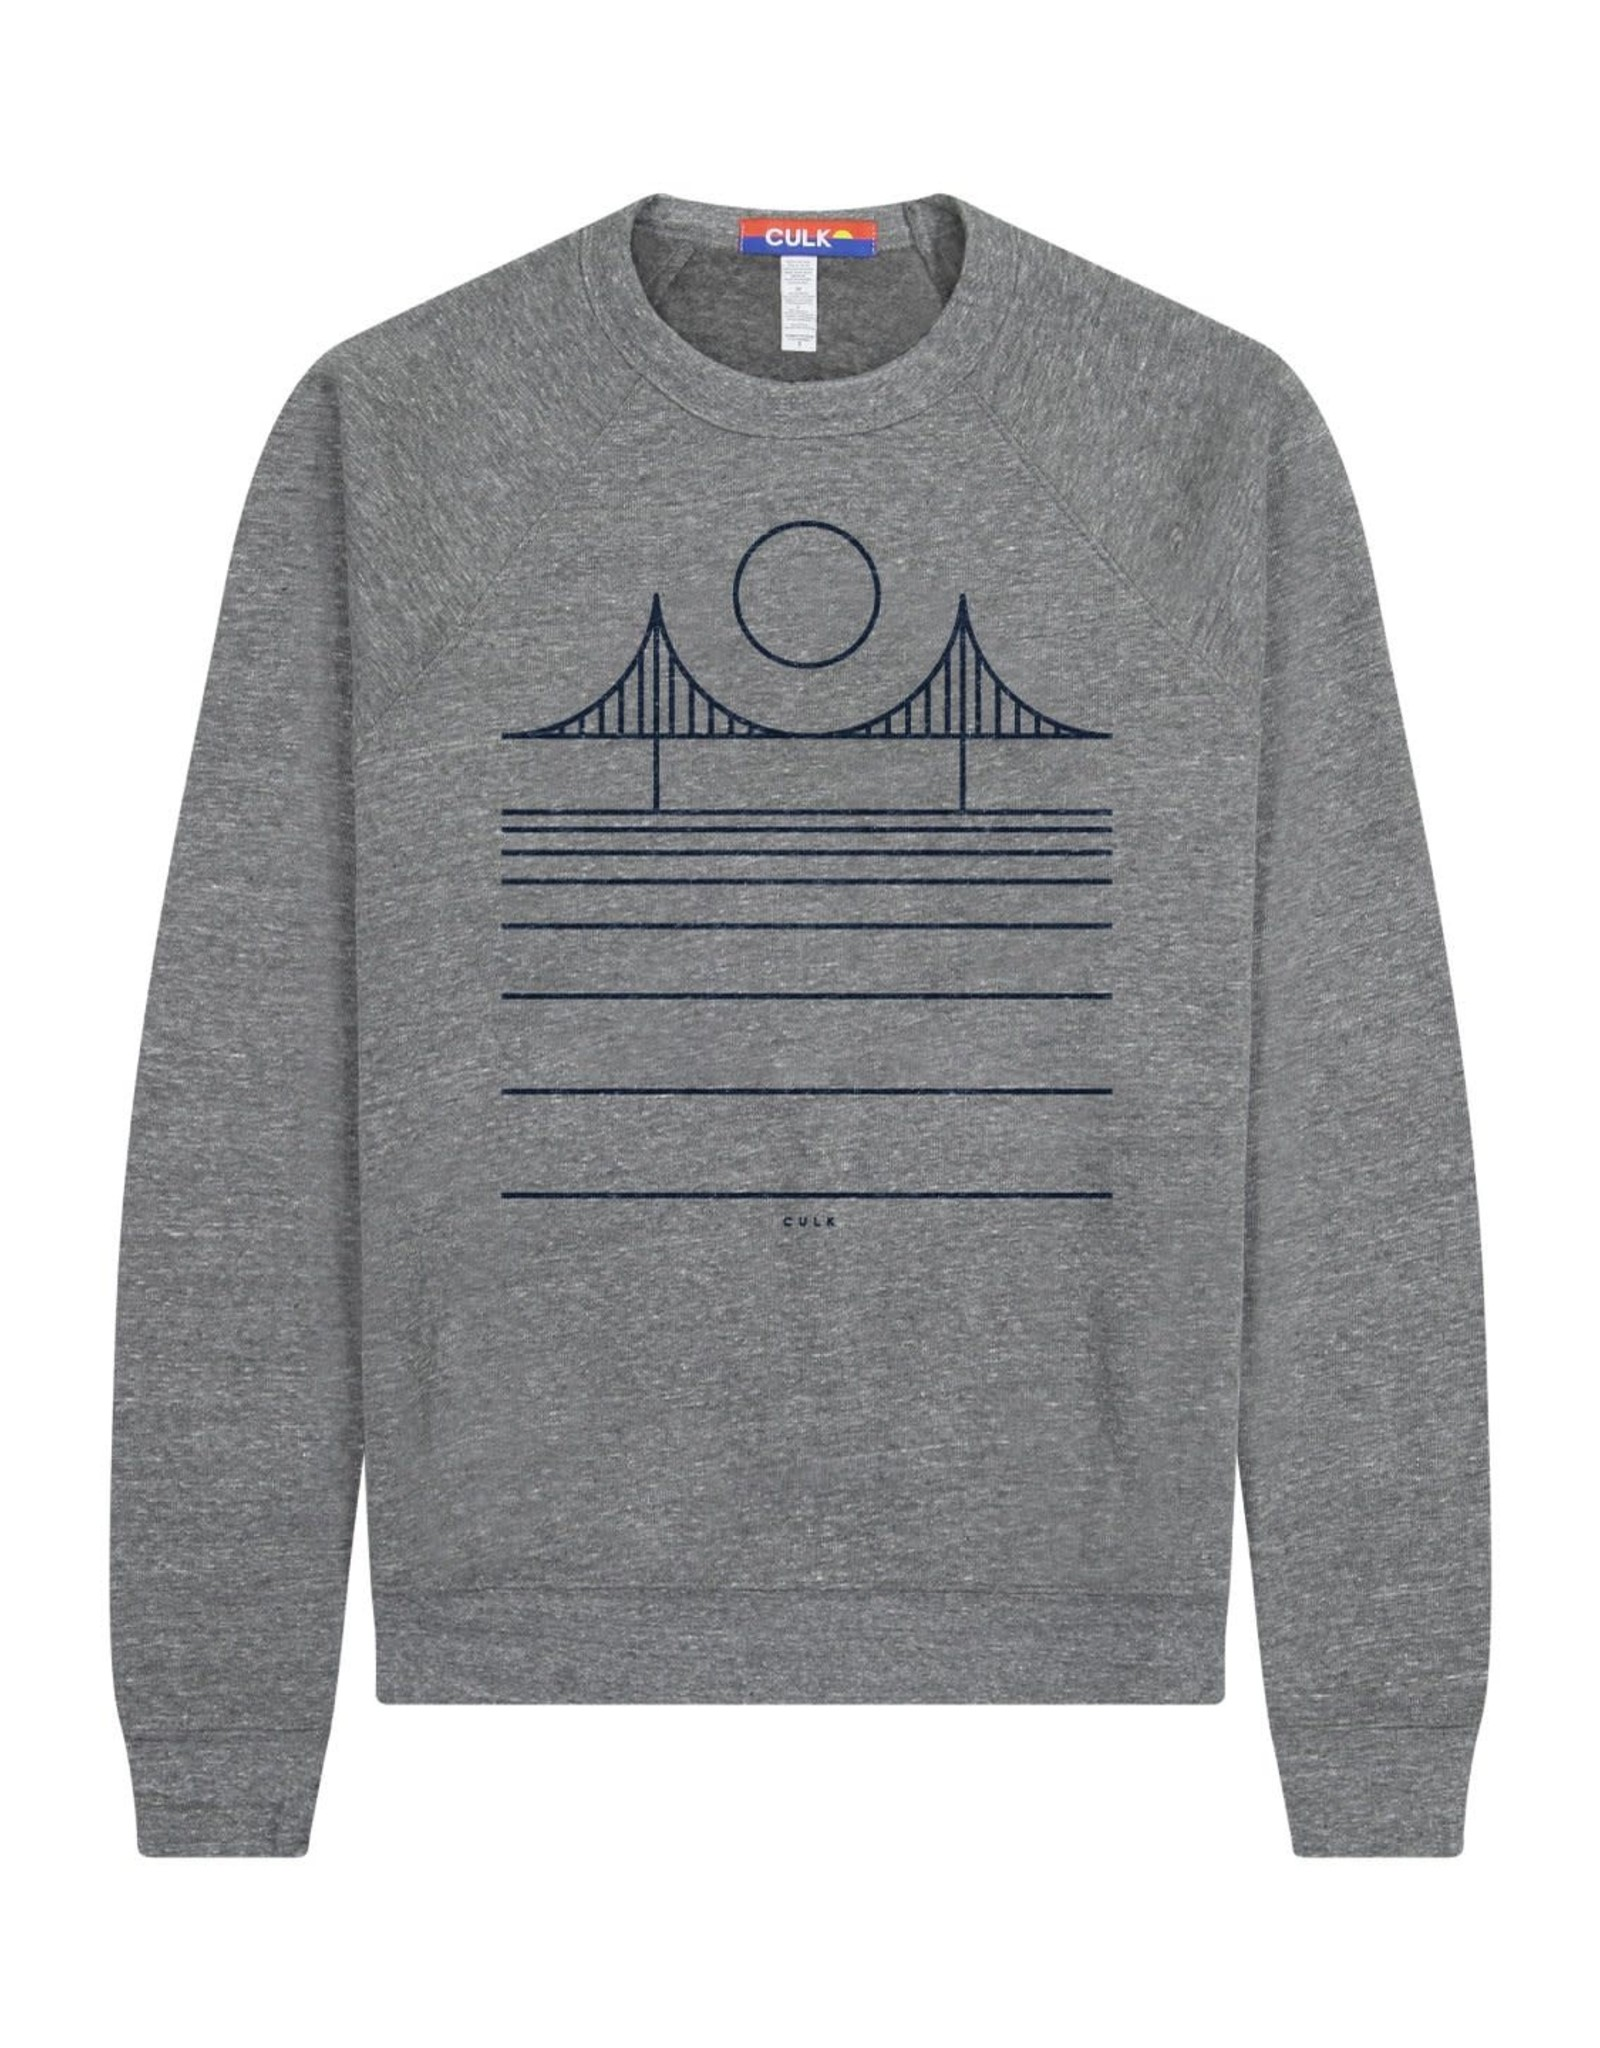 Culk Minimal Bridge Crewneck Sweatshirt - Grey